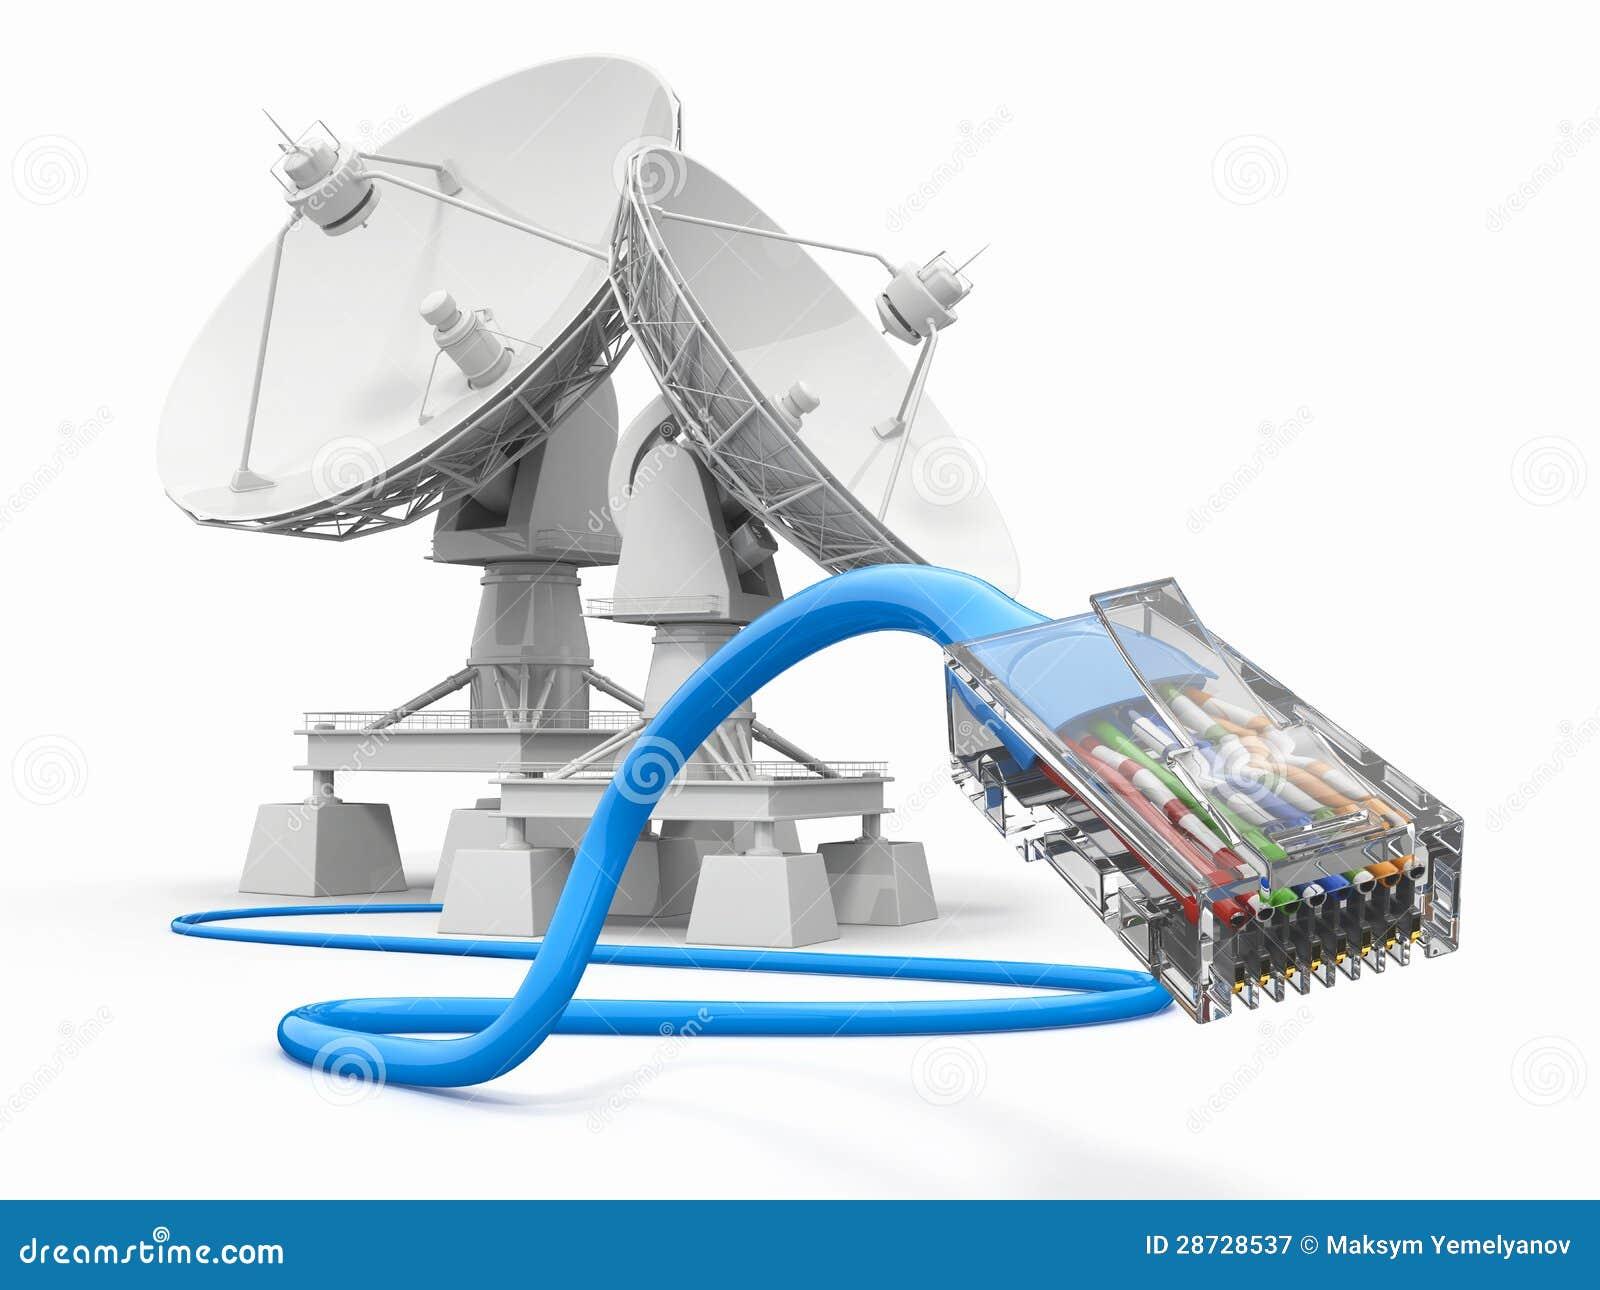 Communiation。 与电缆的卫星盘。